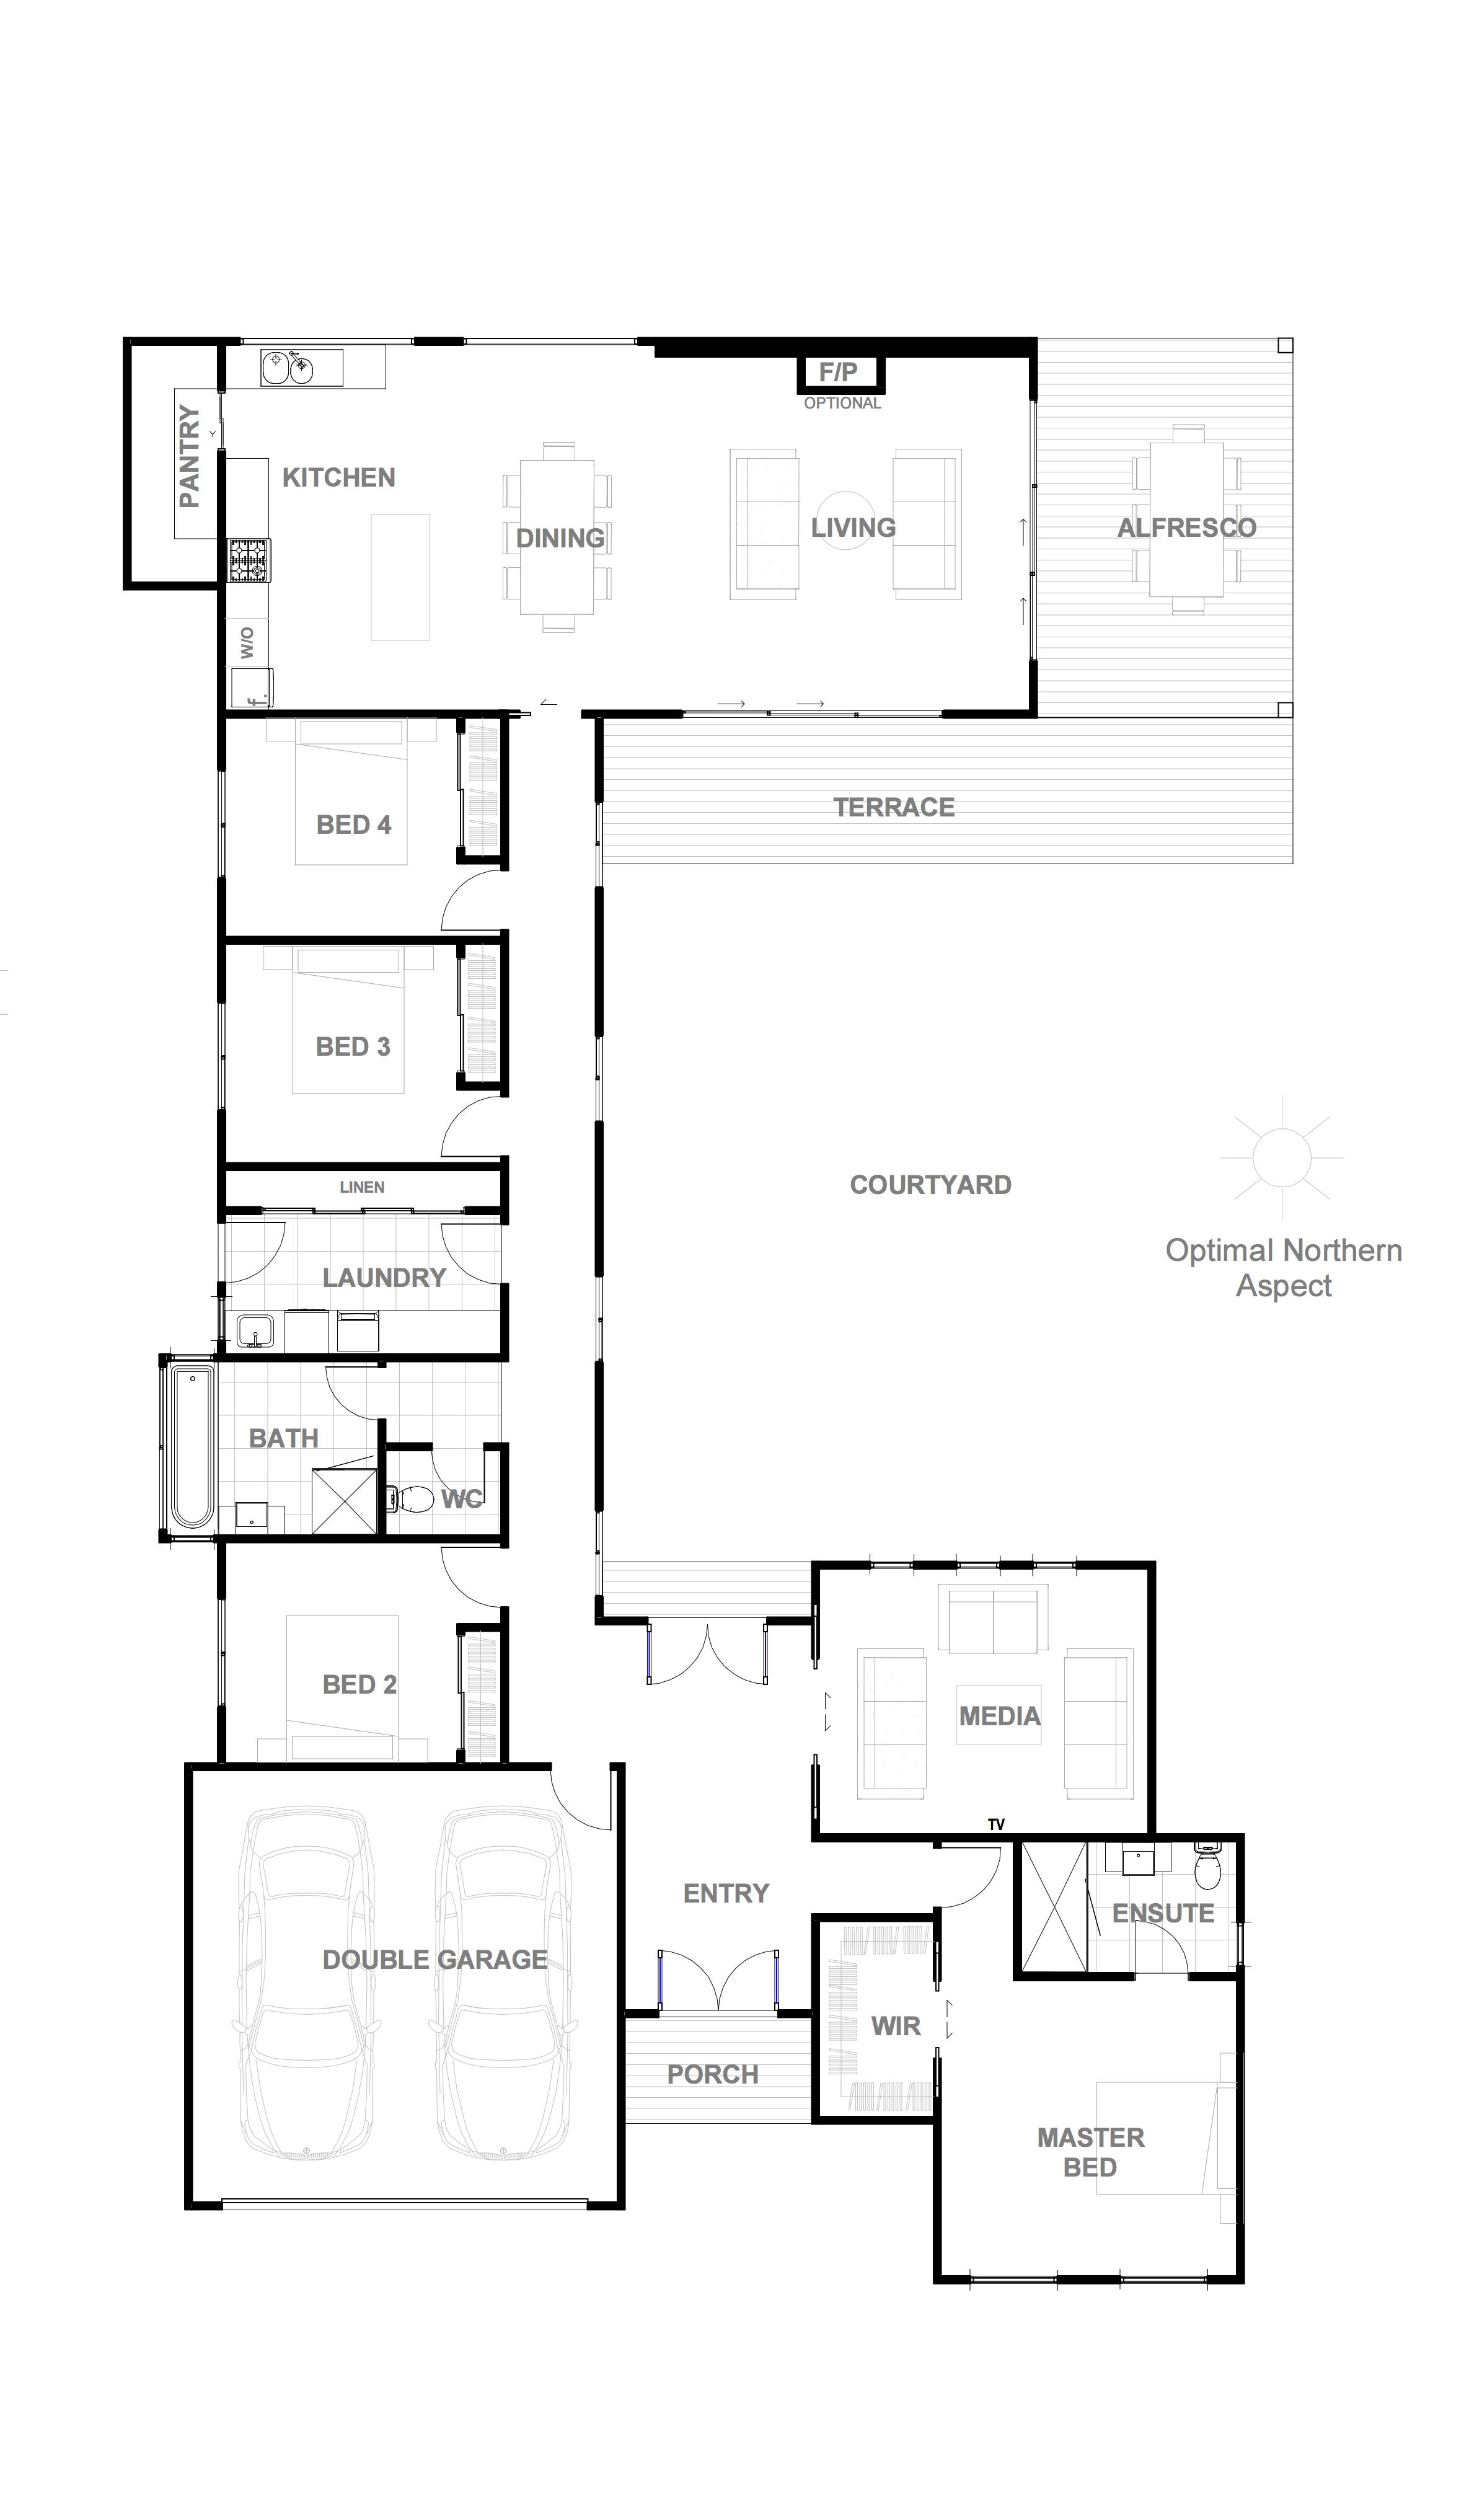 Whangamata Green Homes New Zealand Energy Efficient House Plans Energy Efficient Homes Home Design Floor Plans